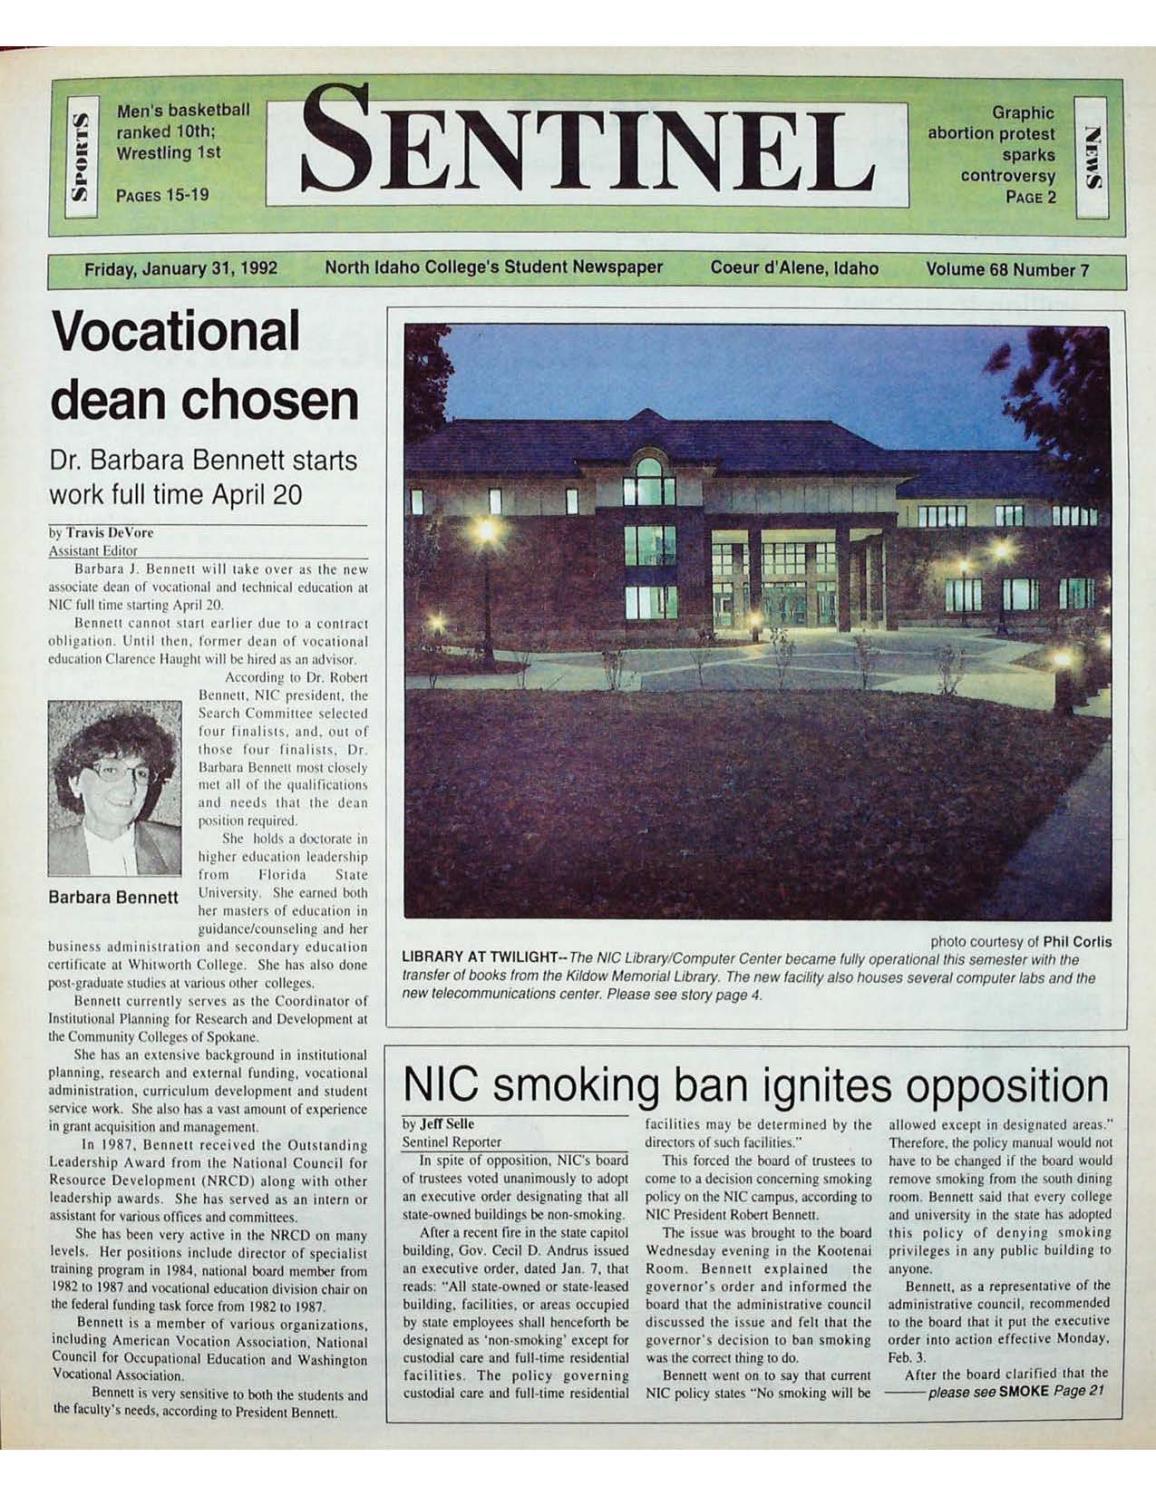 The North Idaho College Sentinel Vol 68 No 7, Jan 31, 1992